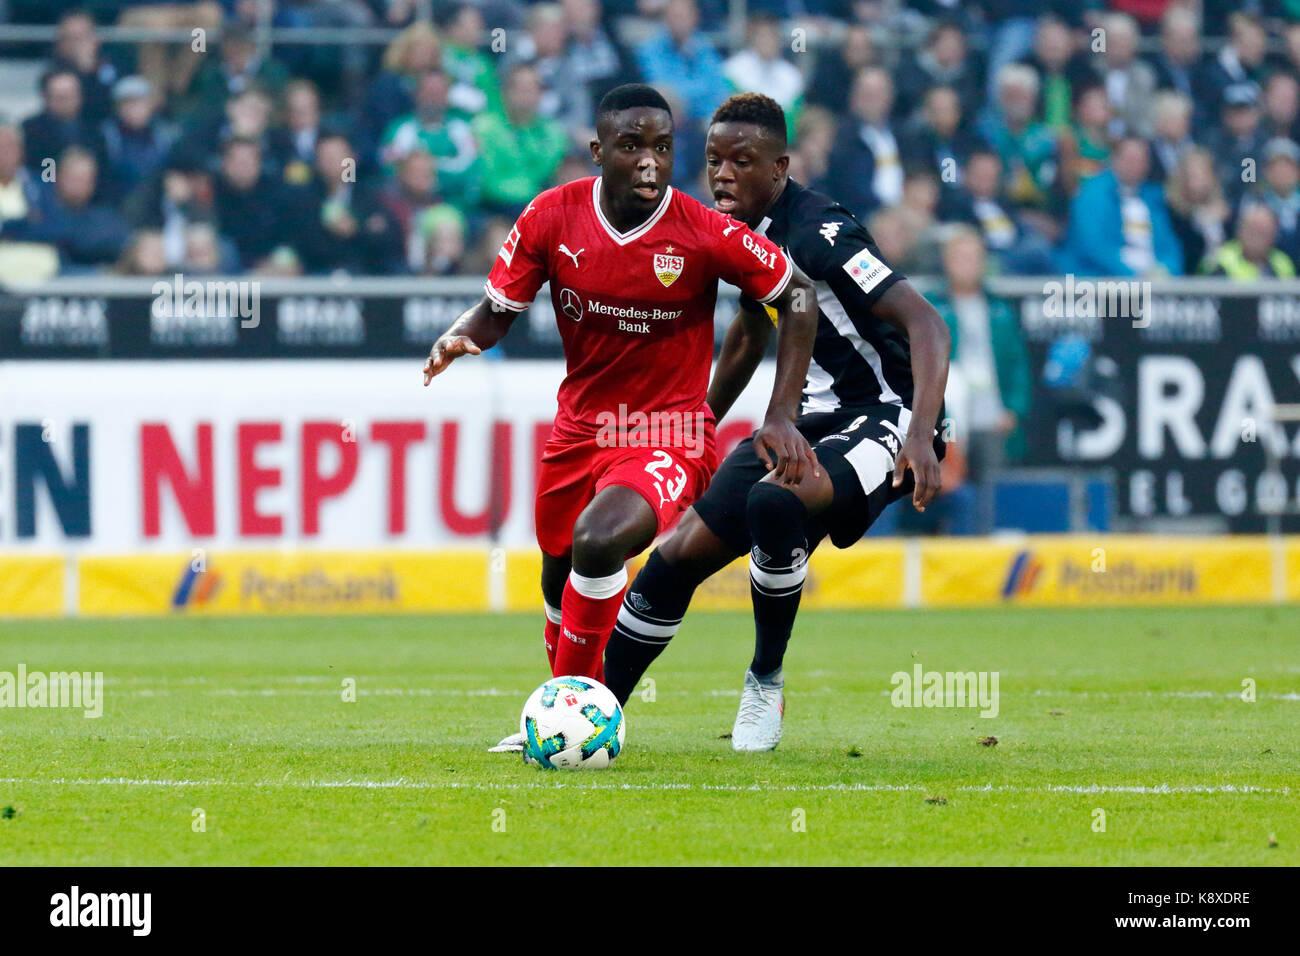 sports, football, Bundesliga, 2017/2018, Borussia Moenchengladbach vs VfB Stuttgart 2:0, scene of the match, Orel - Stock Image